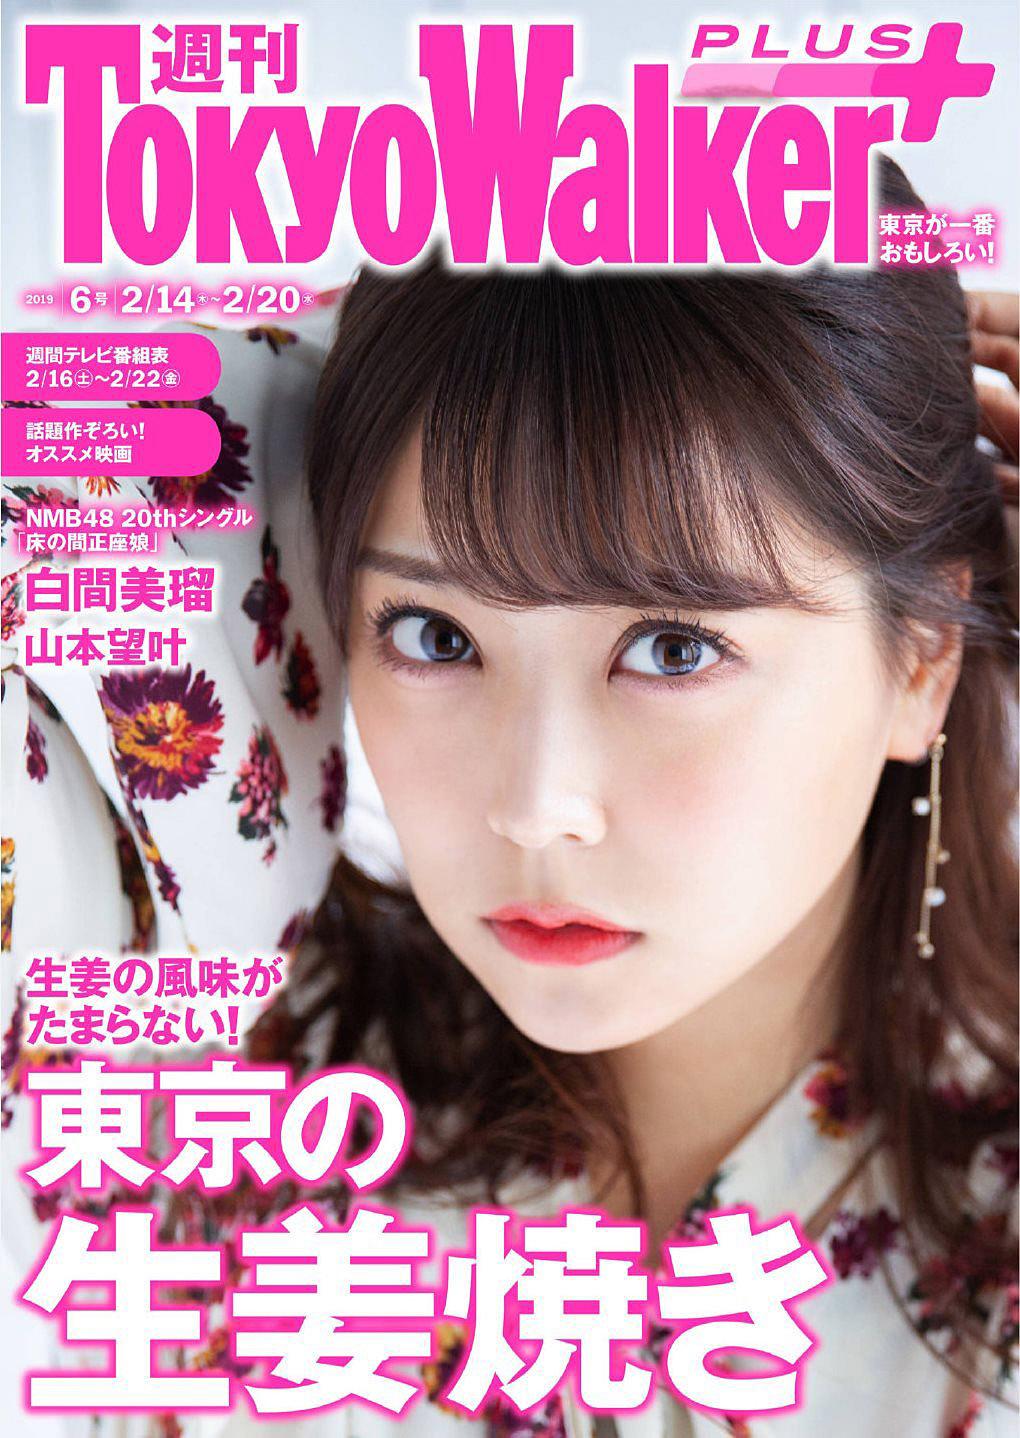 MShiroma Tokyo Walker 190215 01.jpg